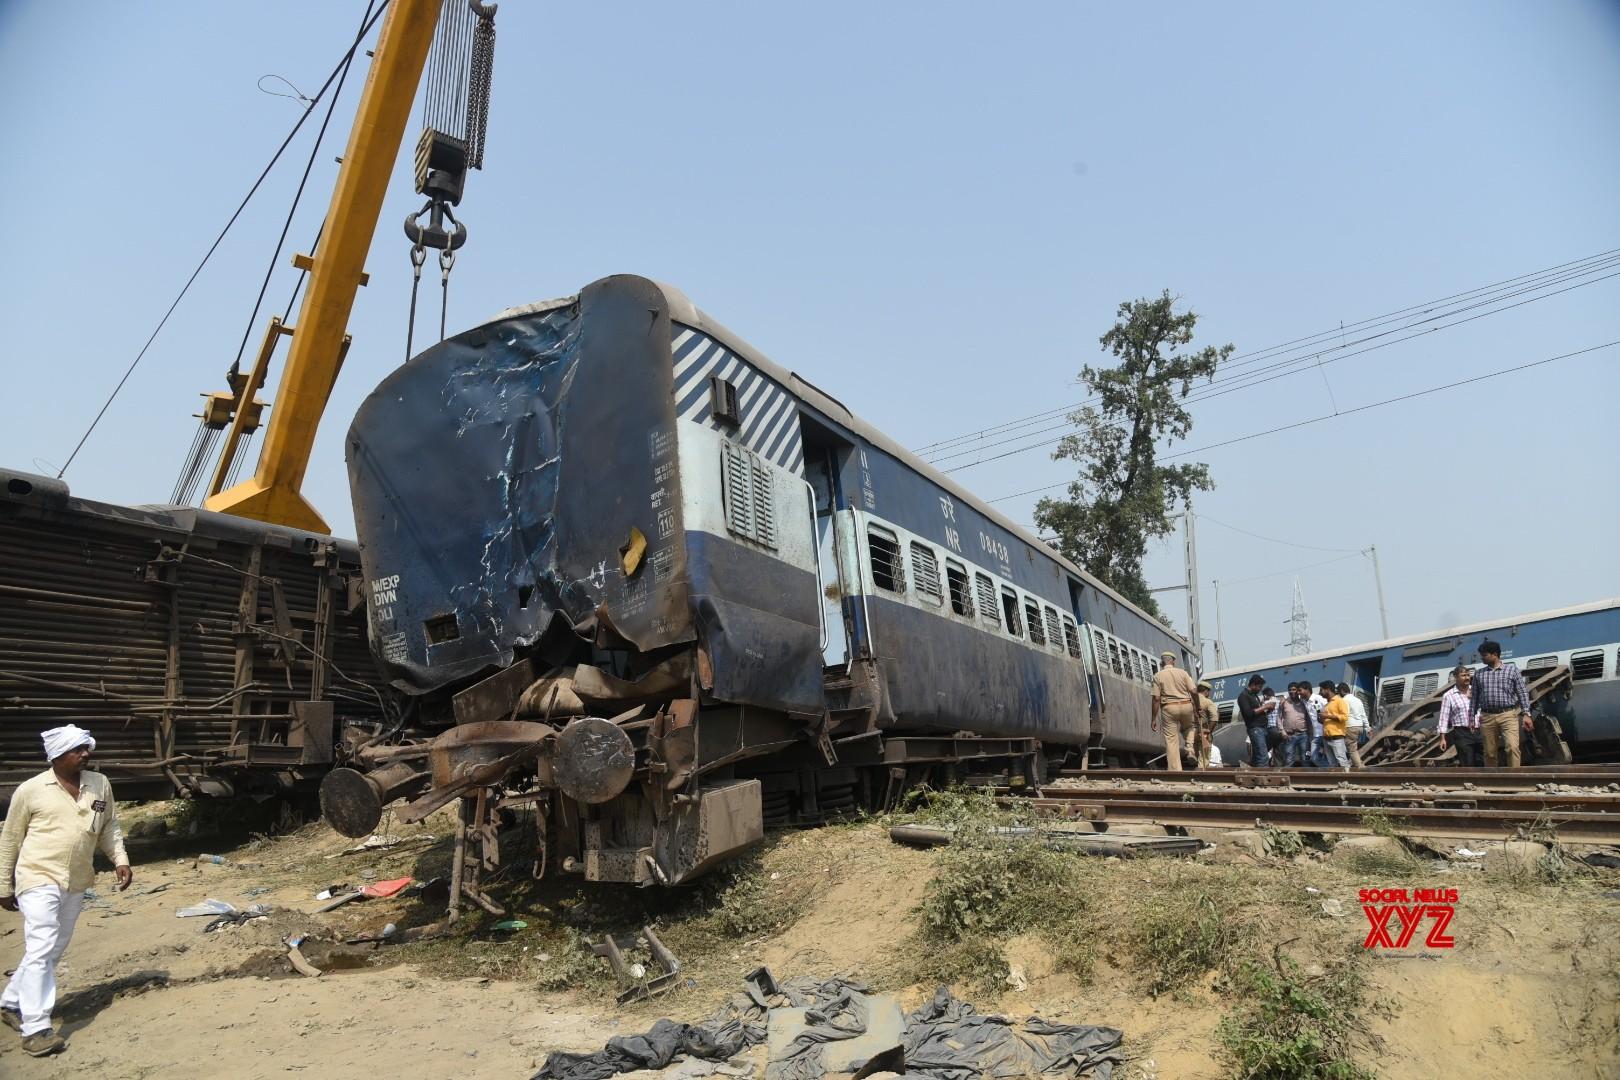 Railway suspends 2 officials over UP derailment